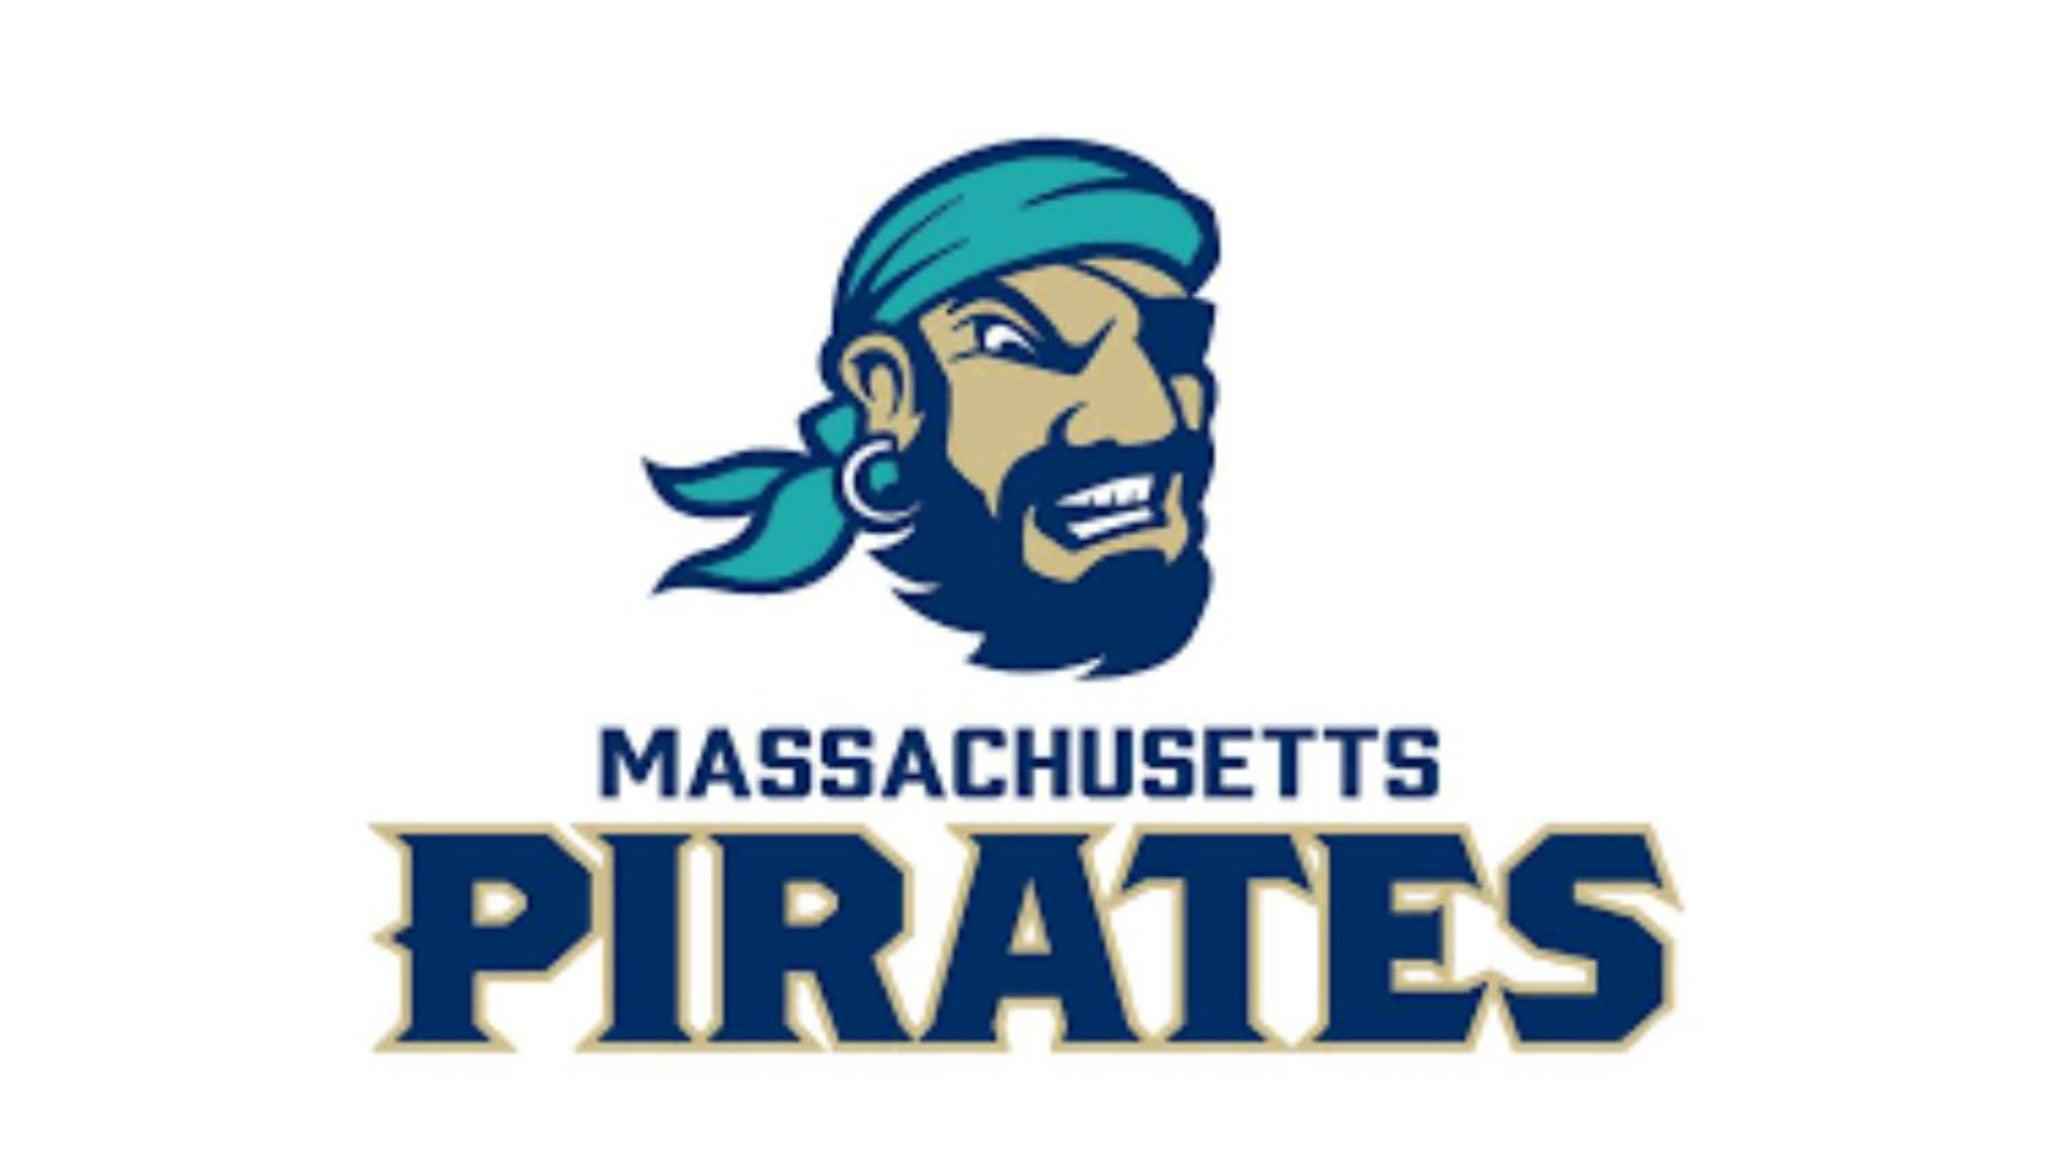 Massachusetts Pirates vs. Carolina Cobras at DCU Center